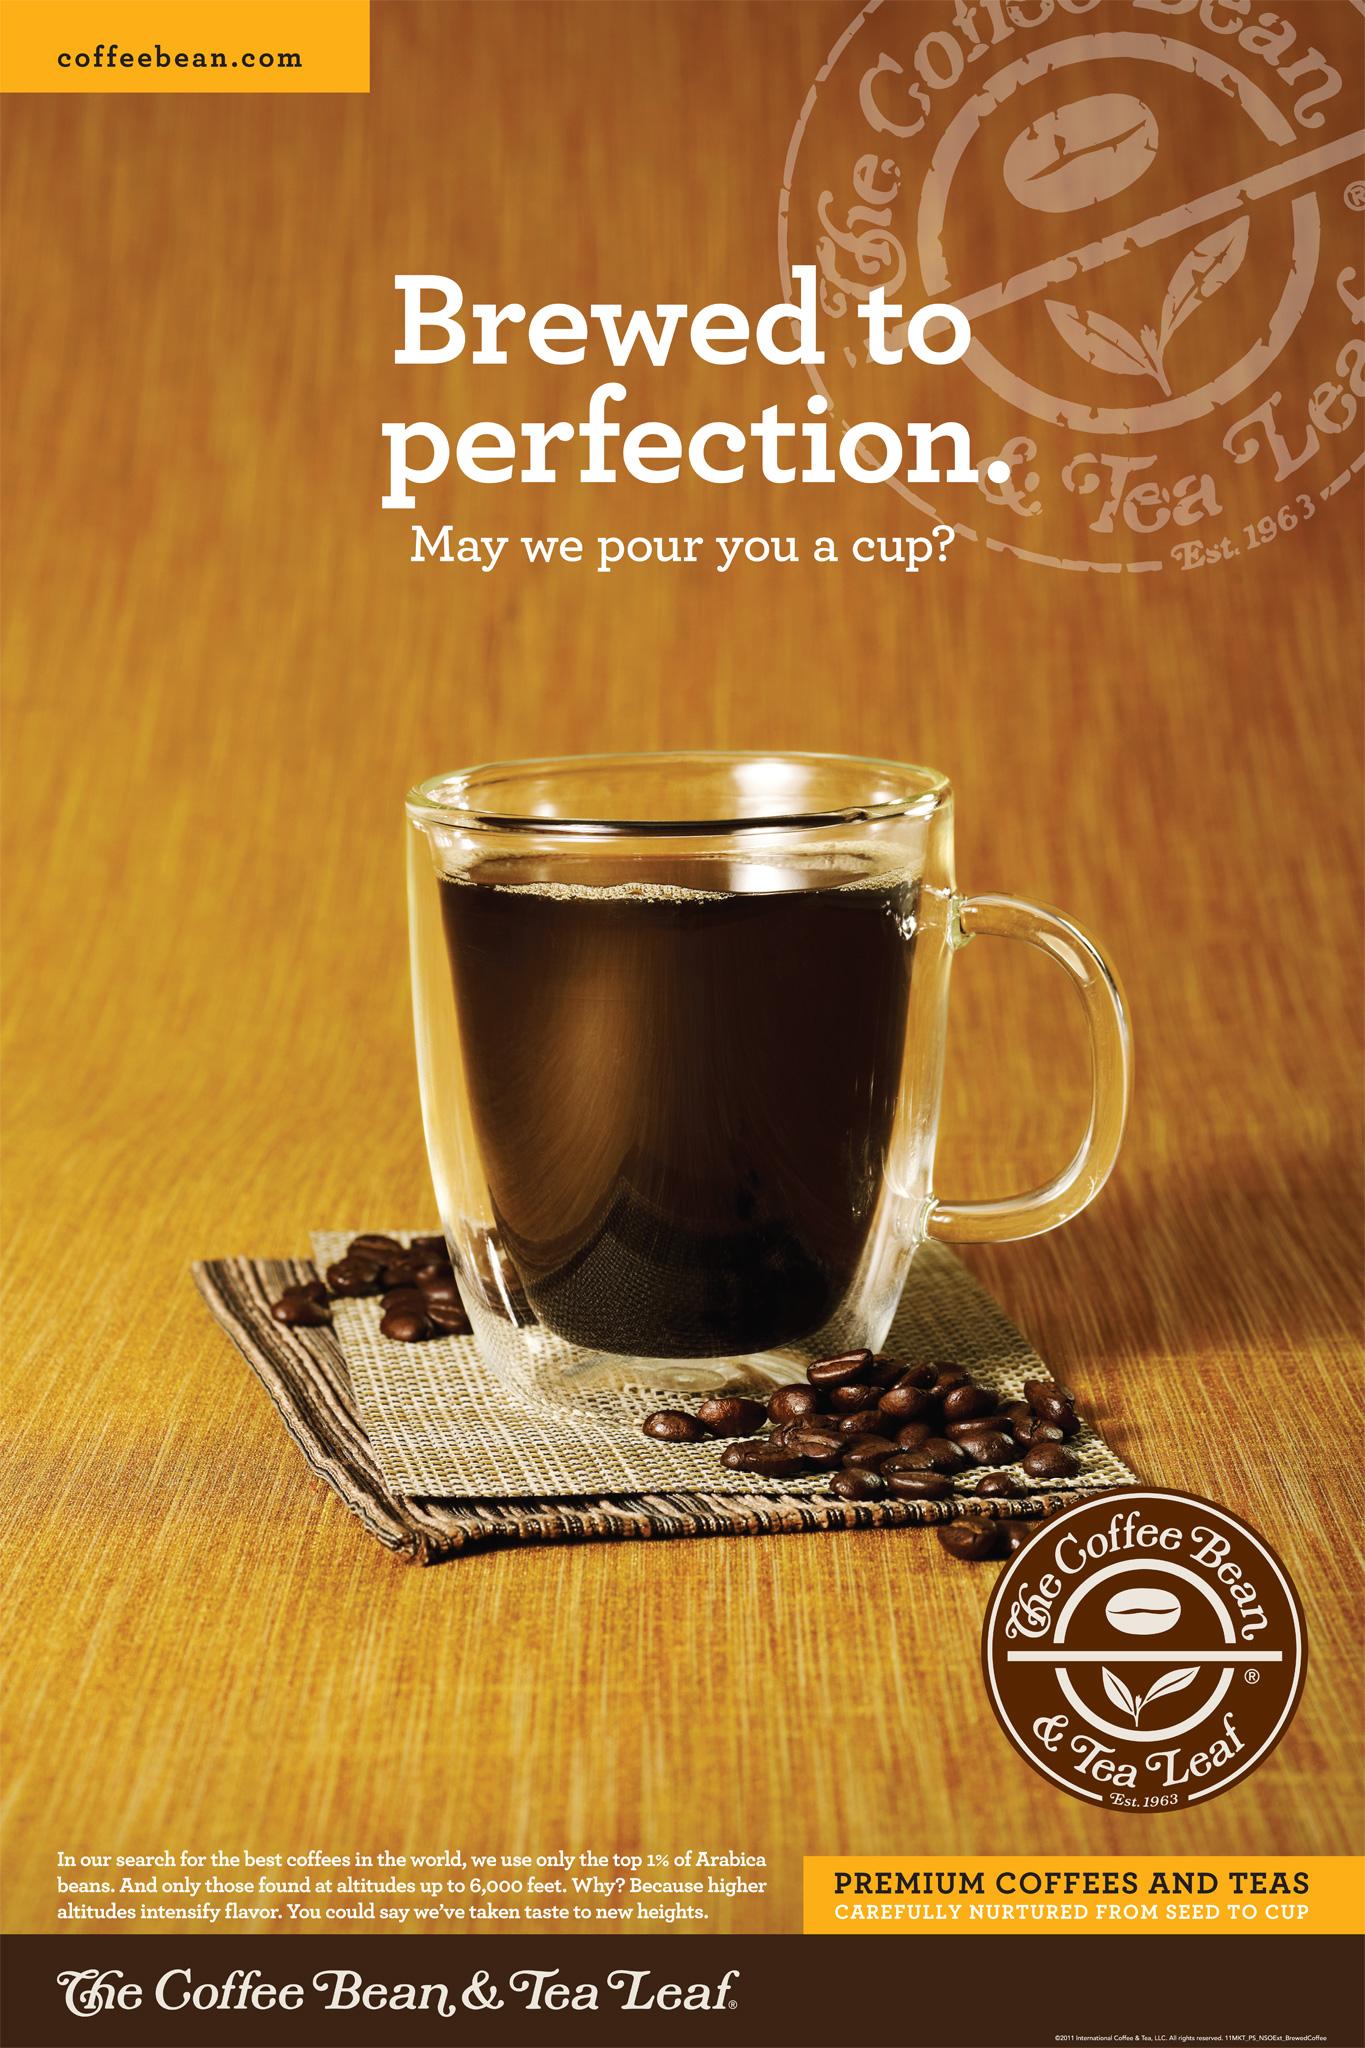 coffee bean and tea leaf fall brewed coffee in layout.jpg